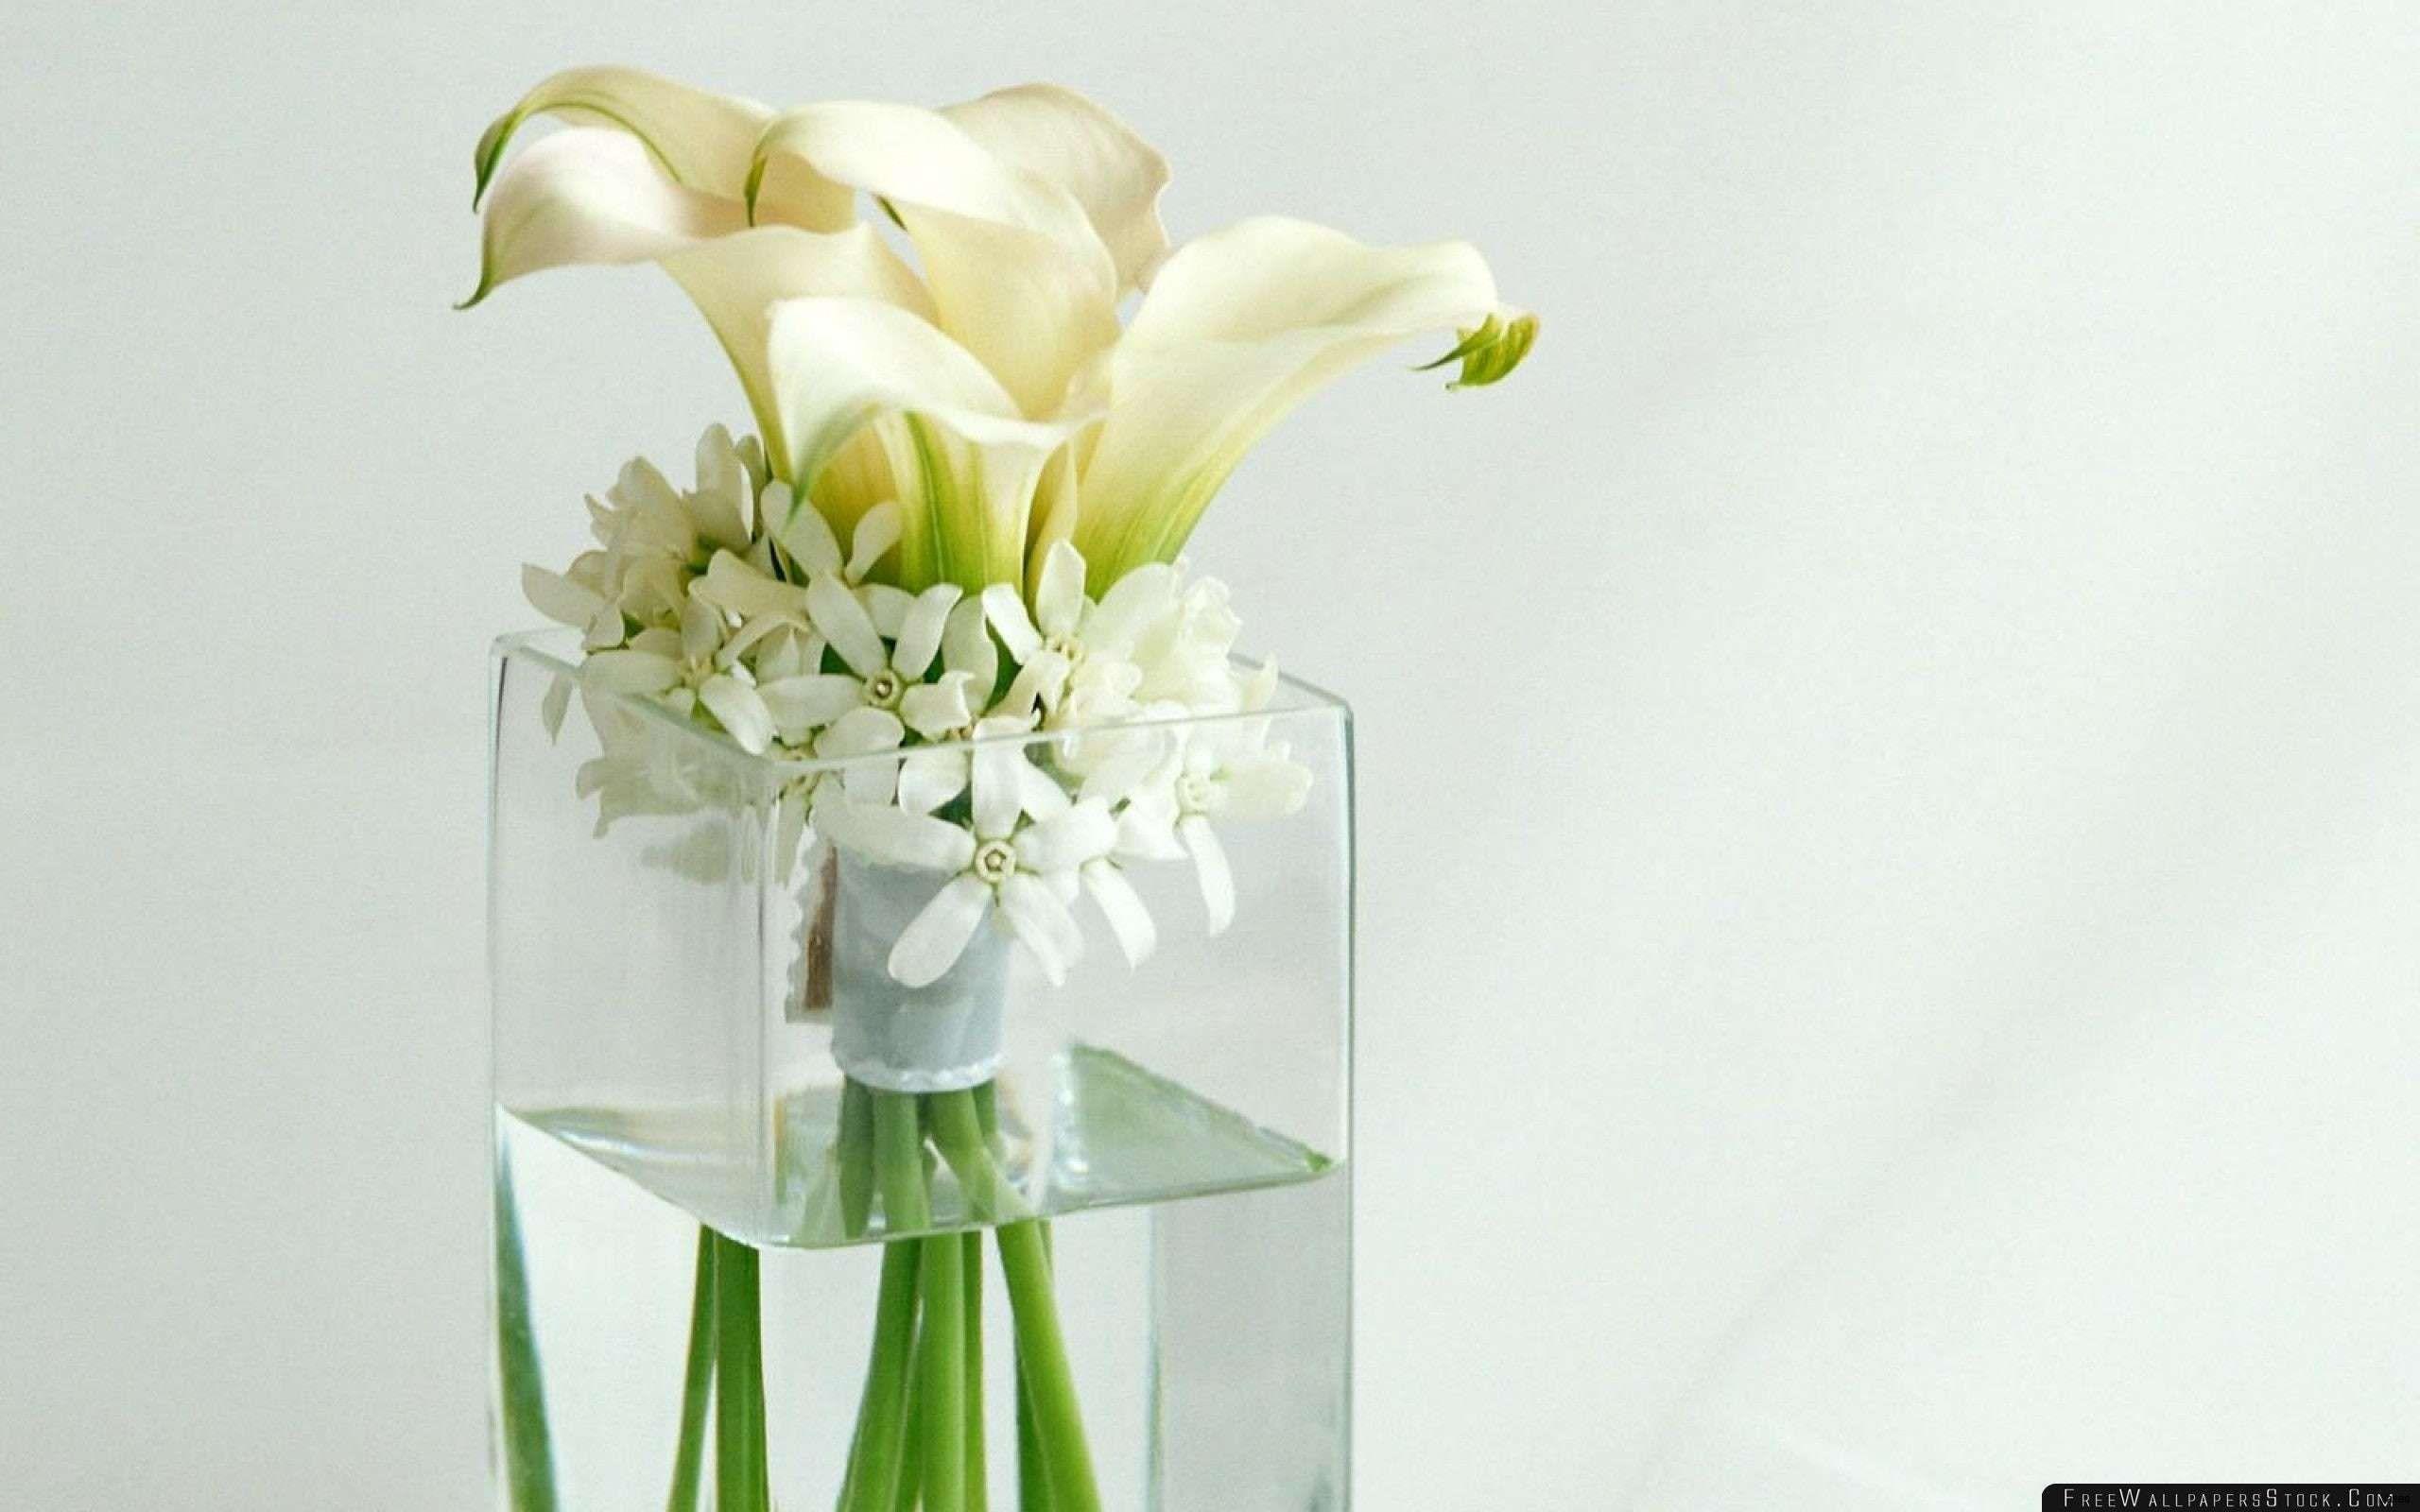 Japanese Ikebana Vases Of Flower Arrangement In Vase Best Of 41 Unique Silk Flower Arrangement Throughout Flower Arrangement In Vase Best Of 41 Unique Silk Flower Arrangement Ideas Image